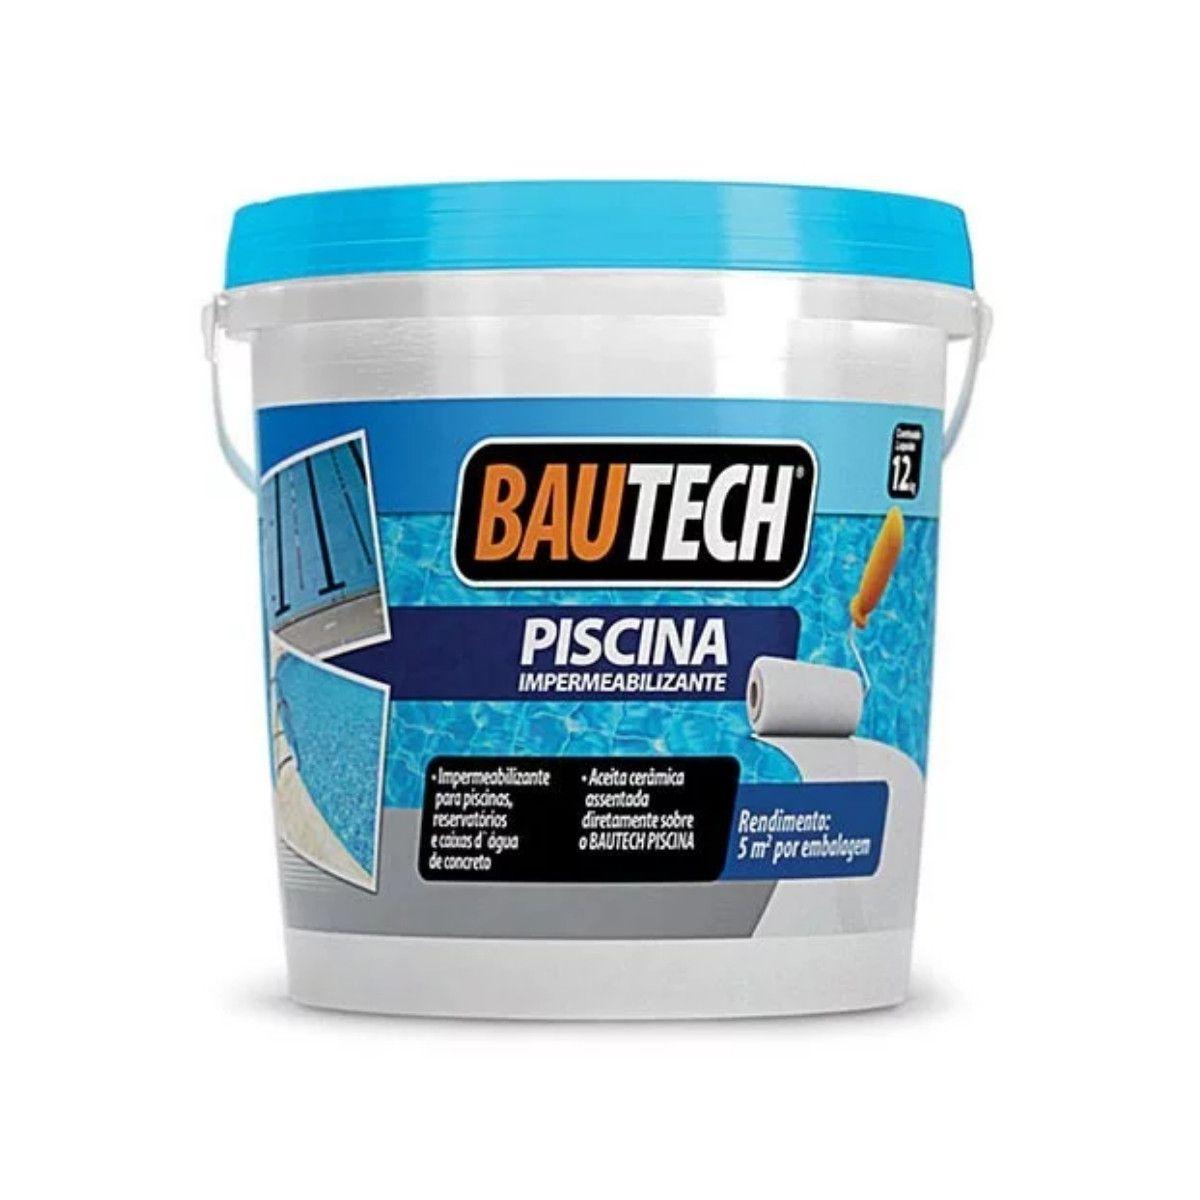 Bautech Impermeabilizante para Piscina 12kg